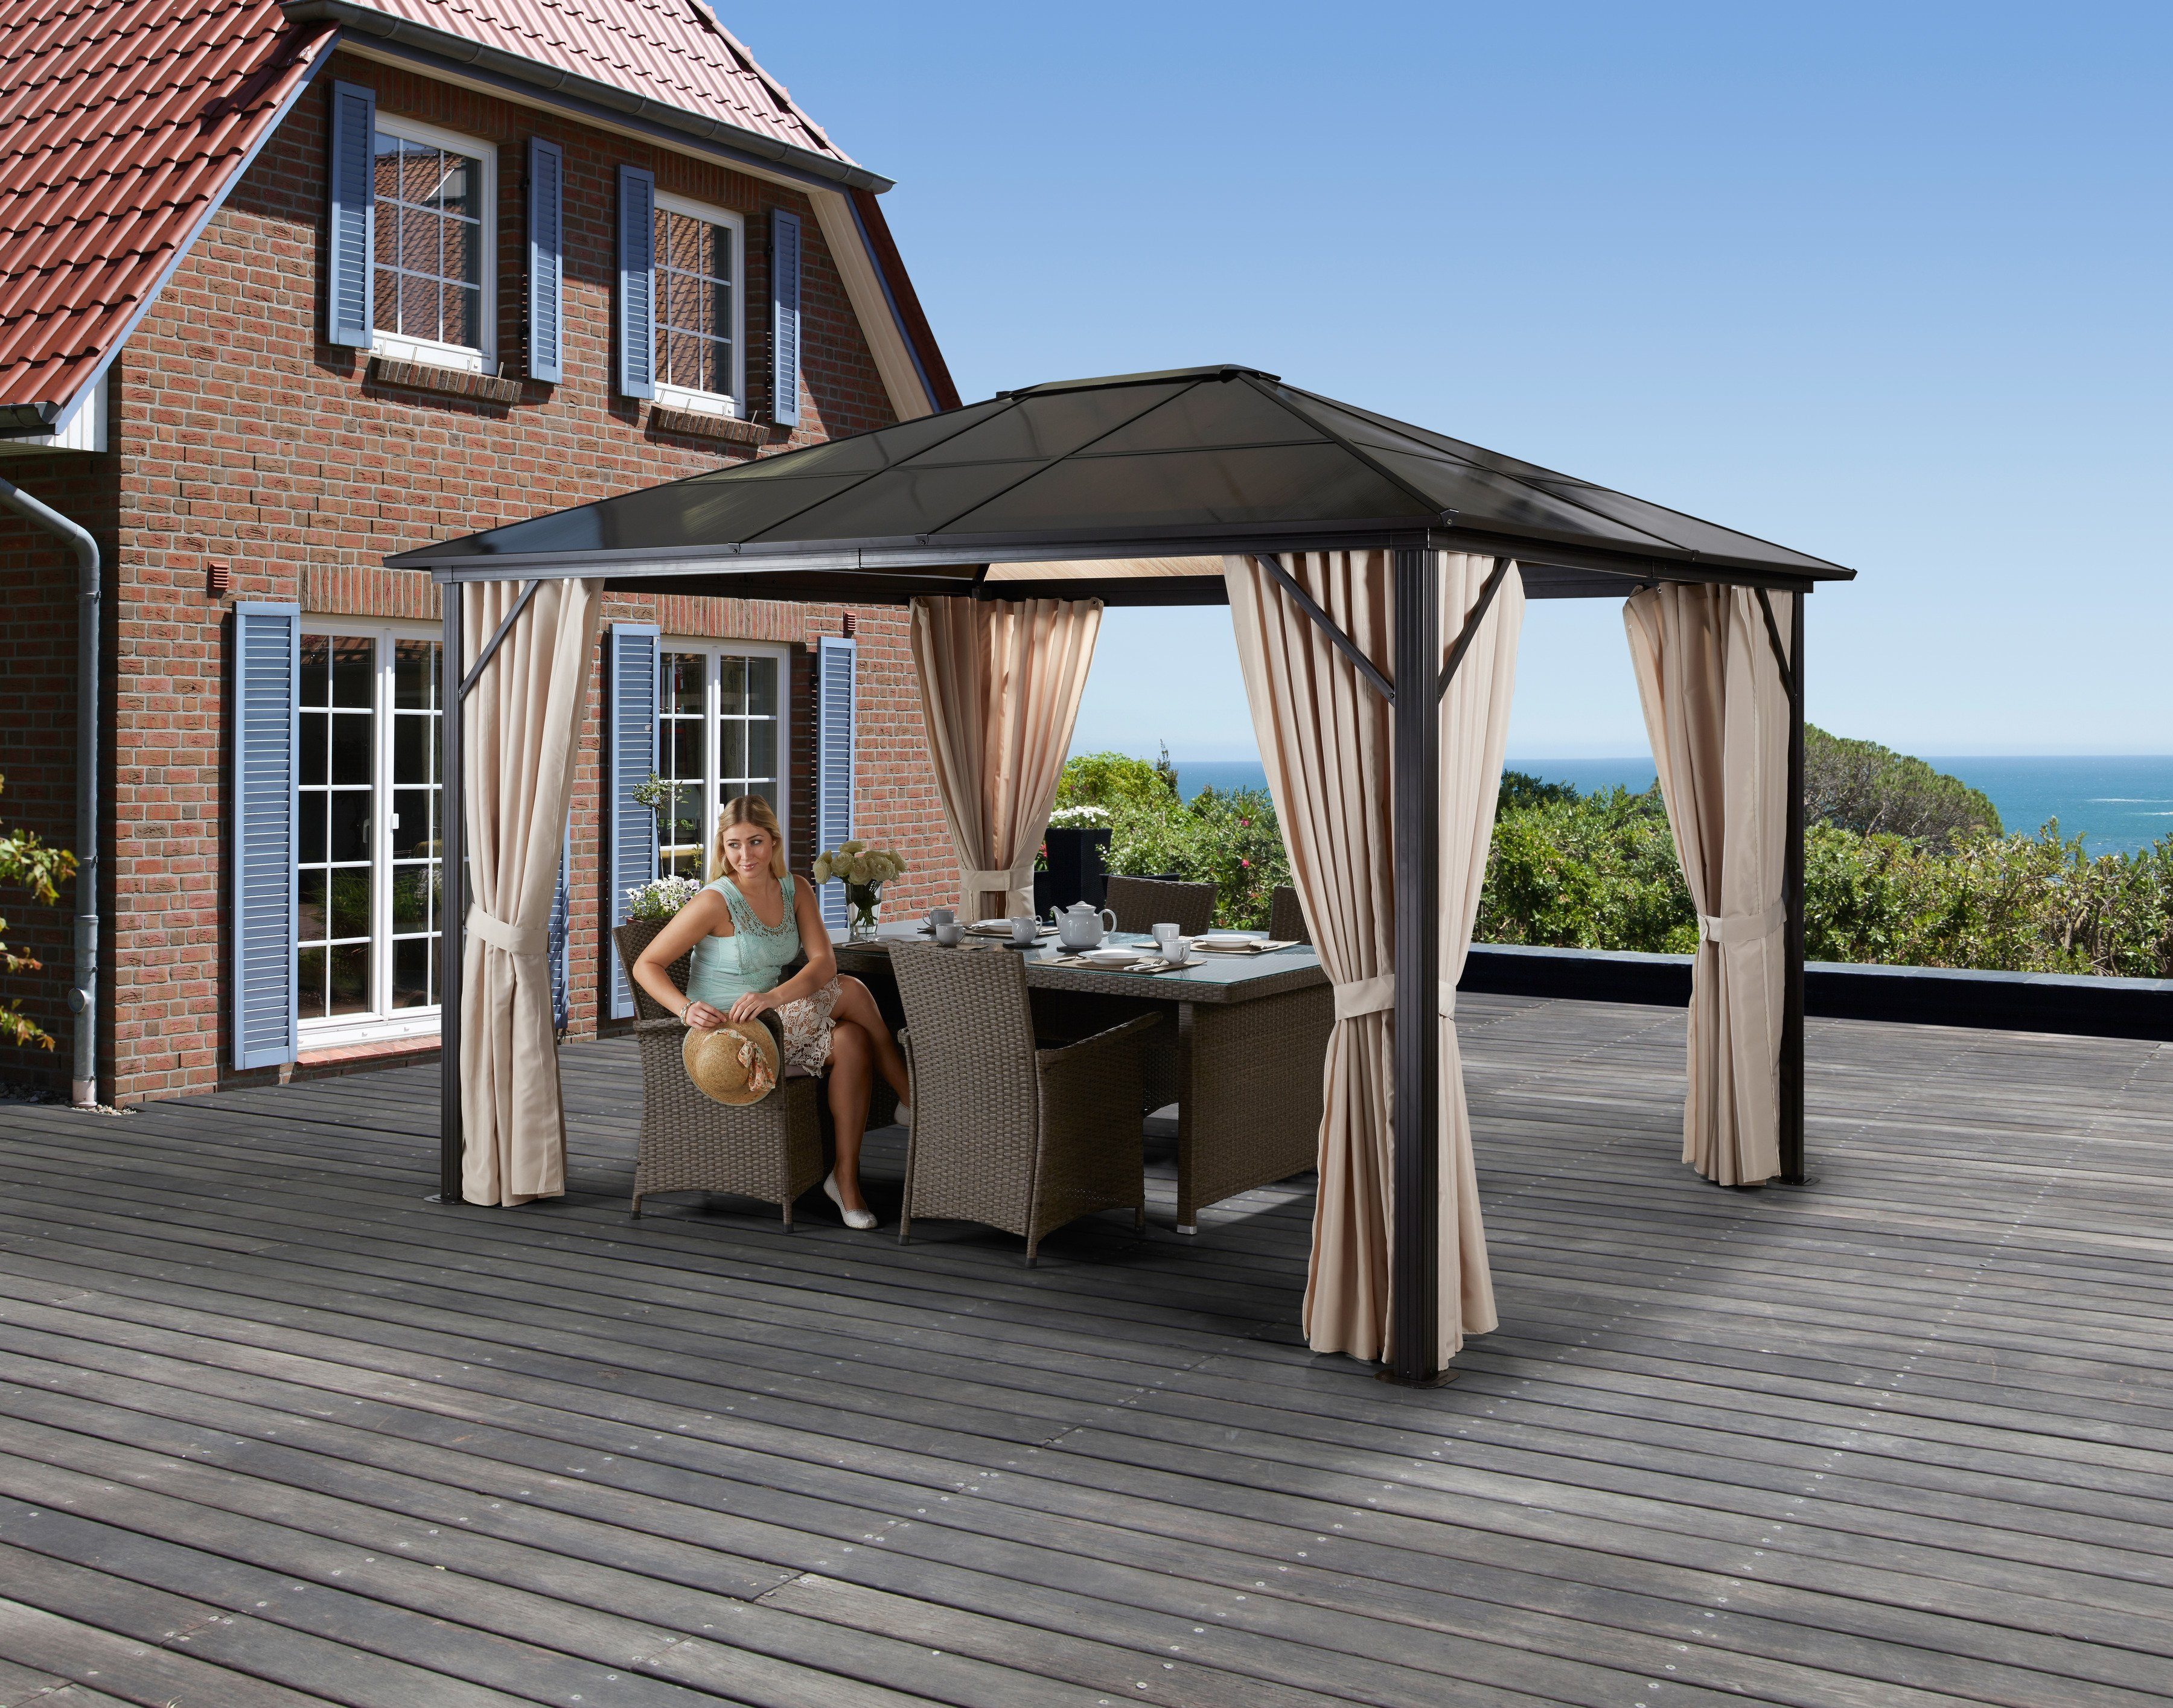 Holz Pavillon Mit Seitenteilen ~ Komplett Set Pavillon »Profi Pavillon«, mit Seitenteilen, BxT